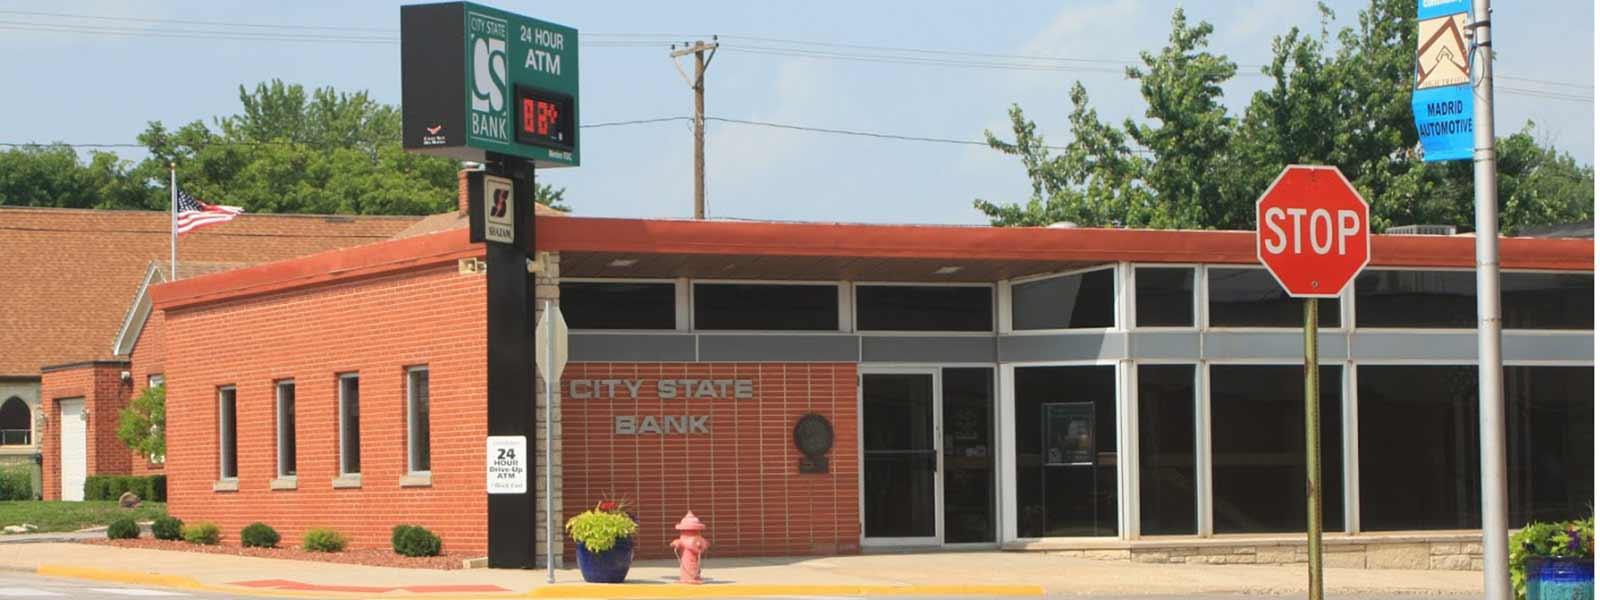 City_State_Bank